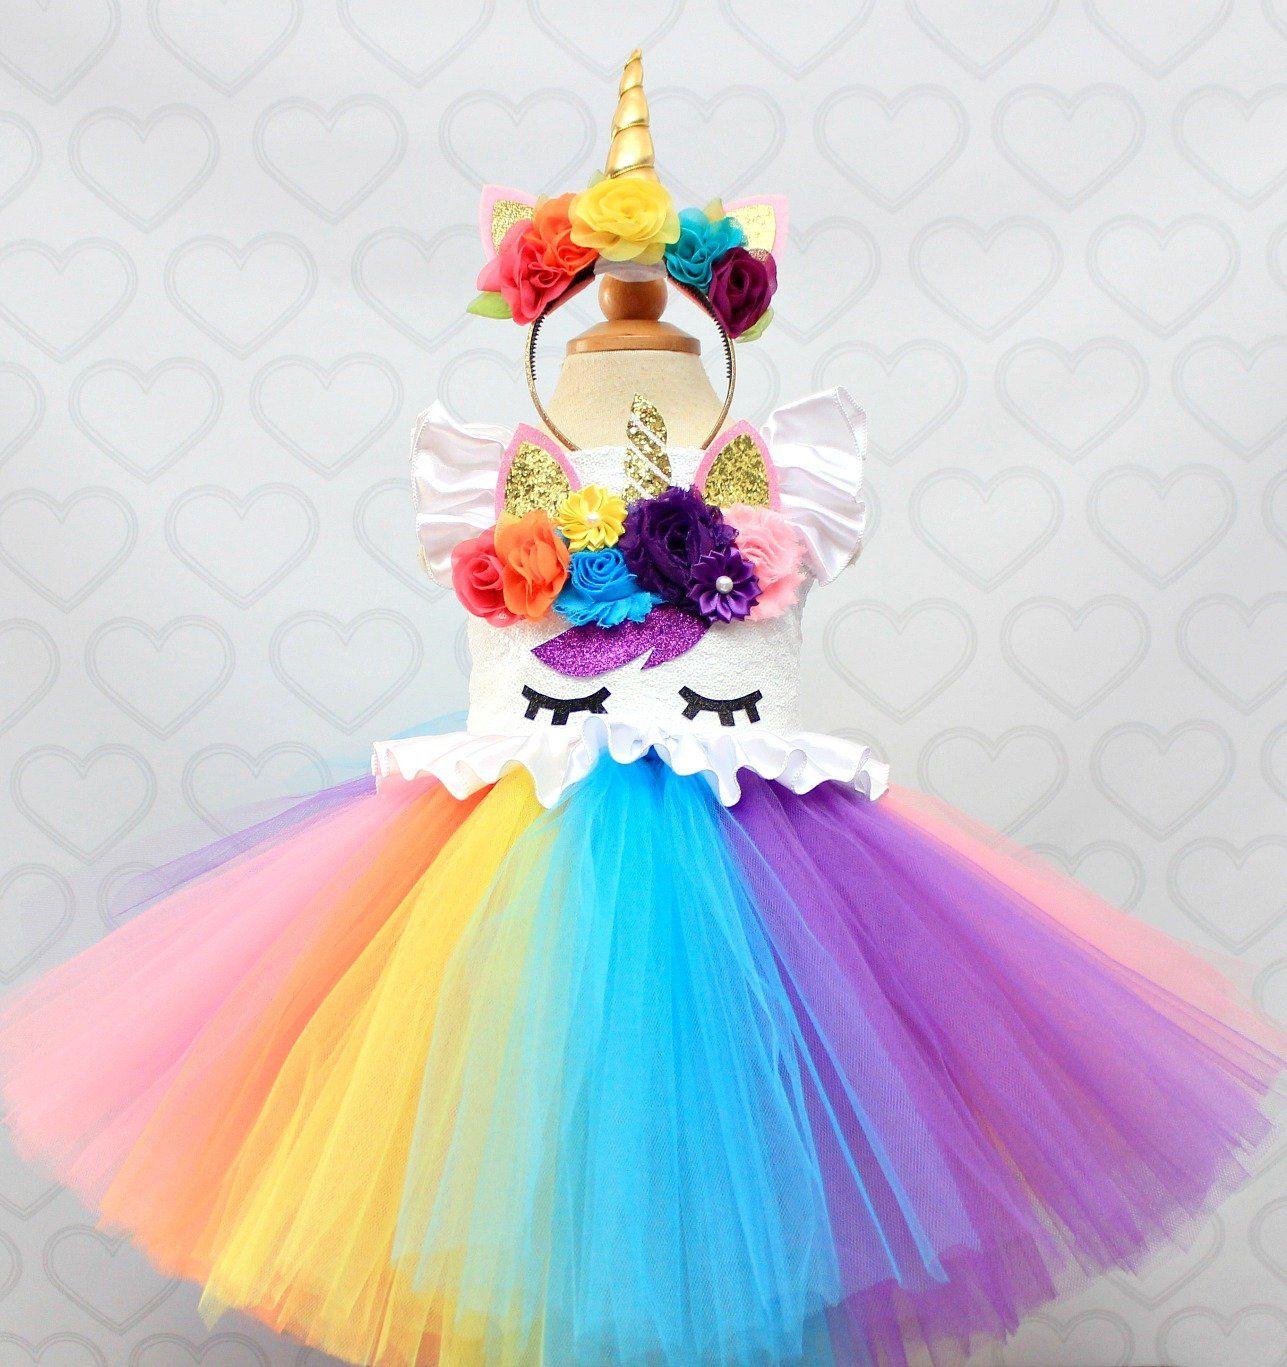 87b75f1d691e3 Unicorn dress-unicorn tutu dress-unicorn birthday dress-unicorn ...